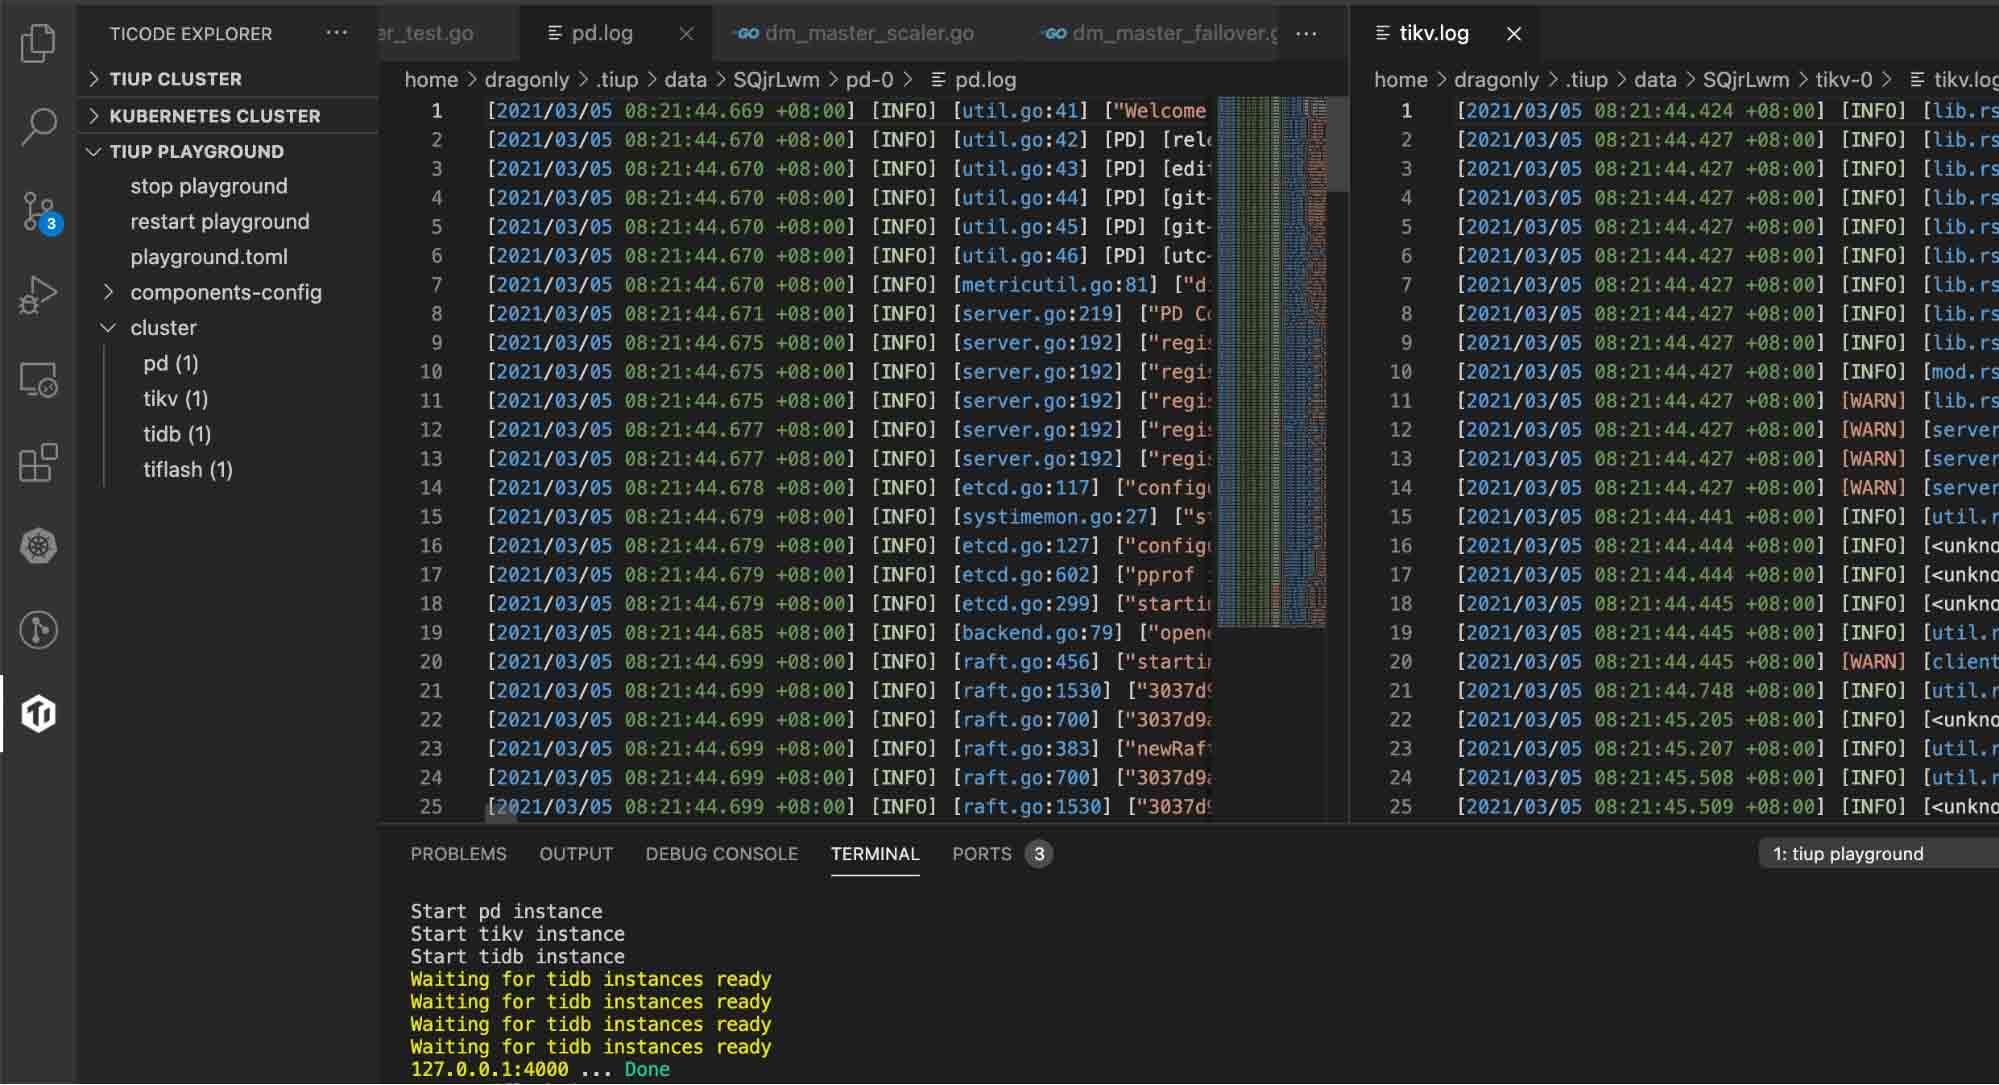 Analyzing TiDB logs in VS Code